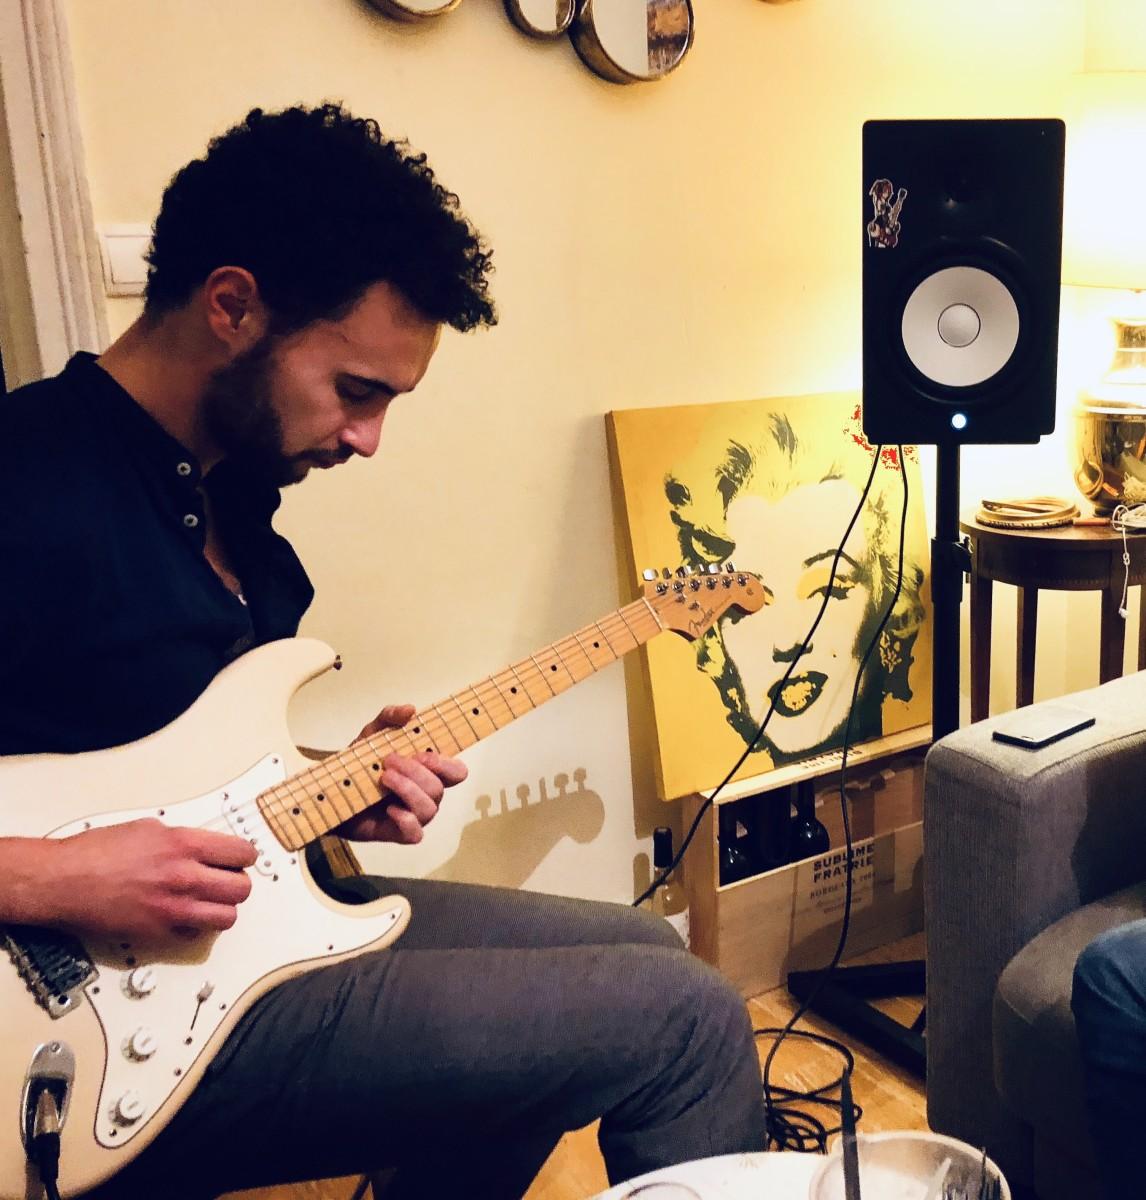 Hugo playing his Fender Strat